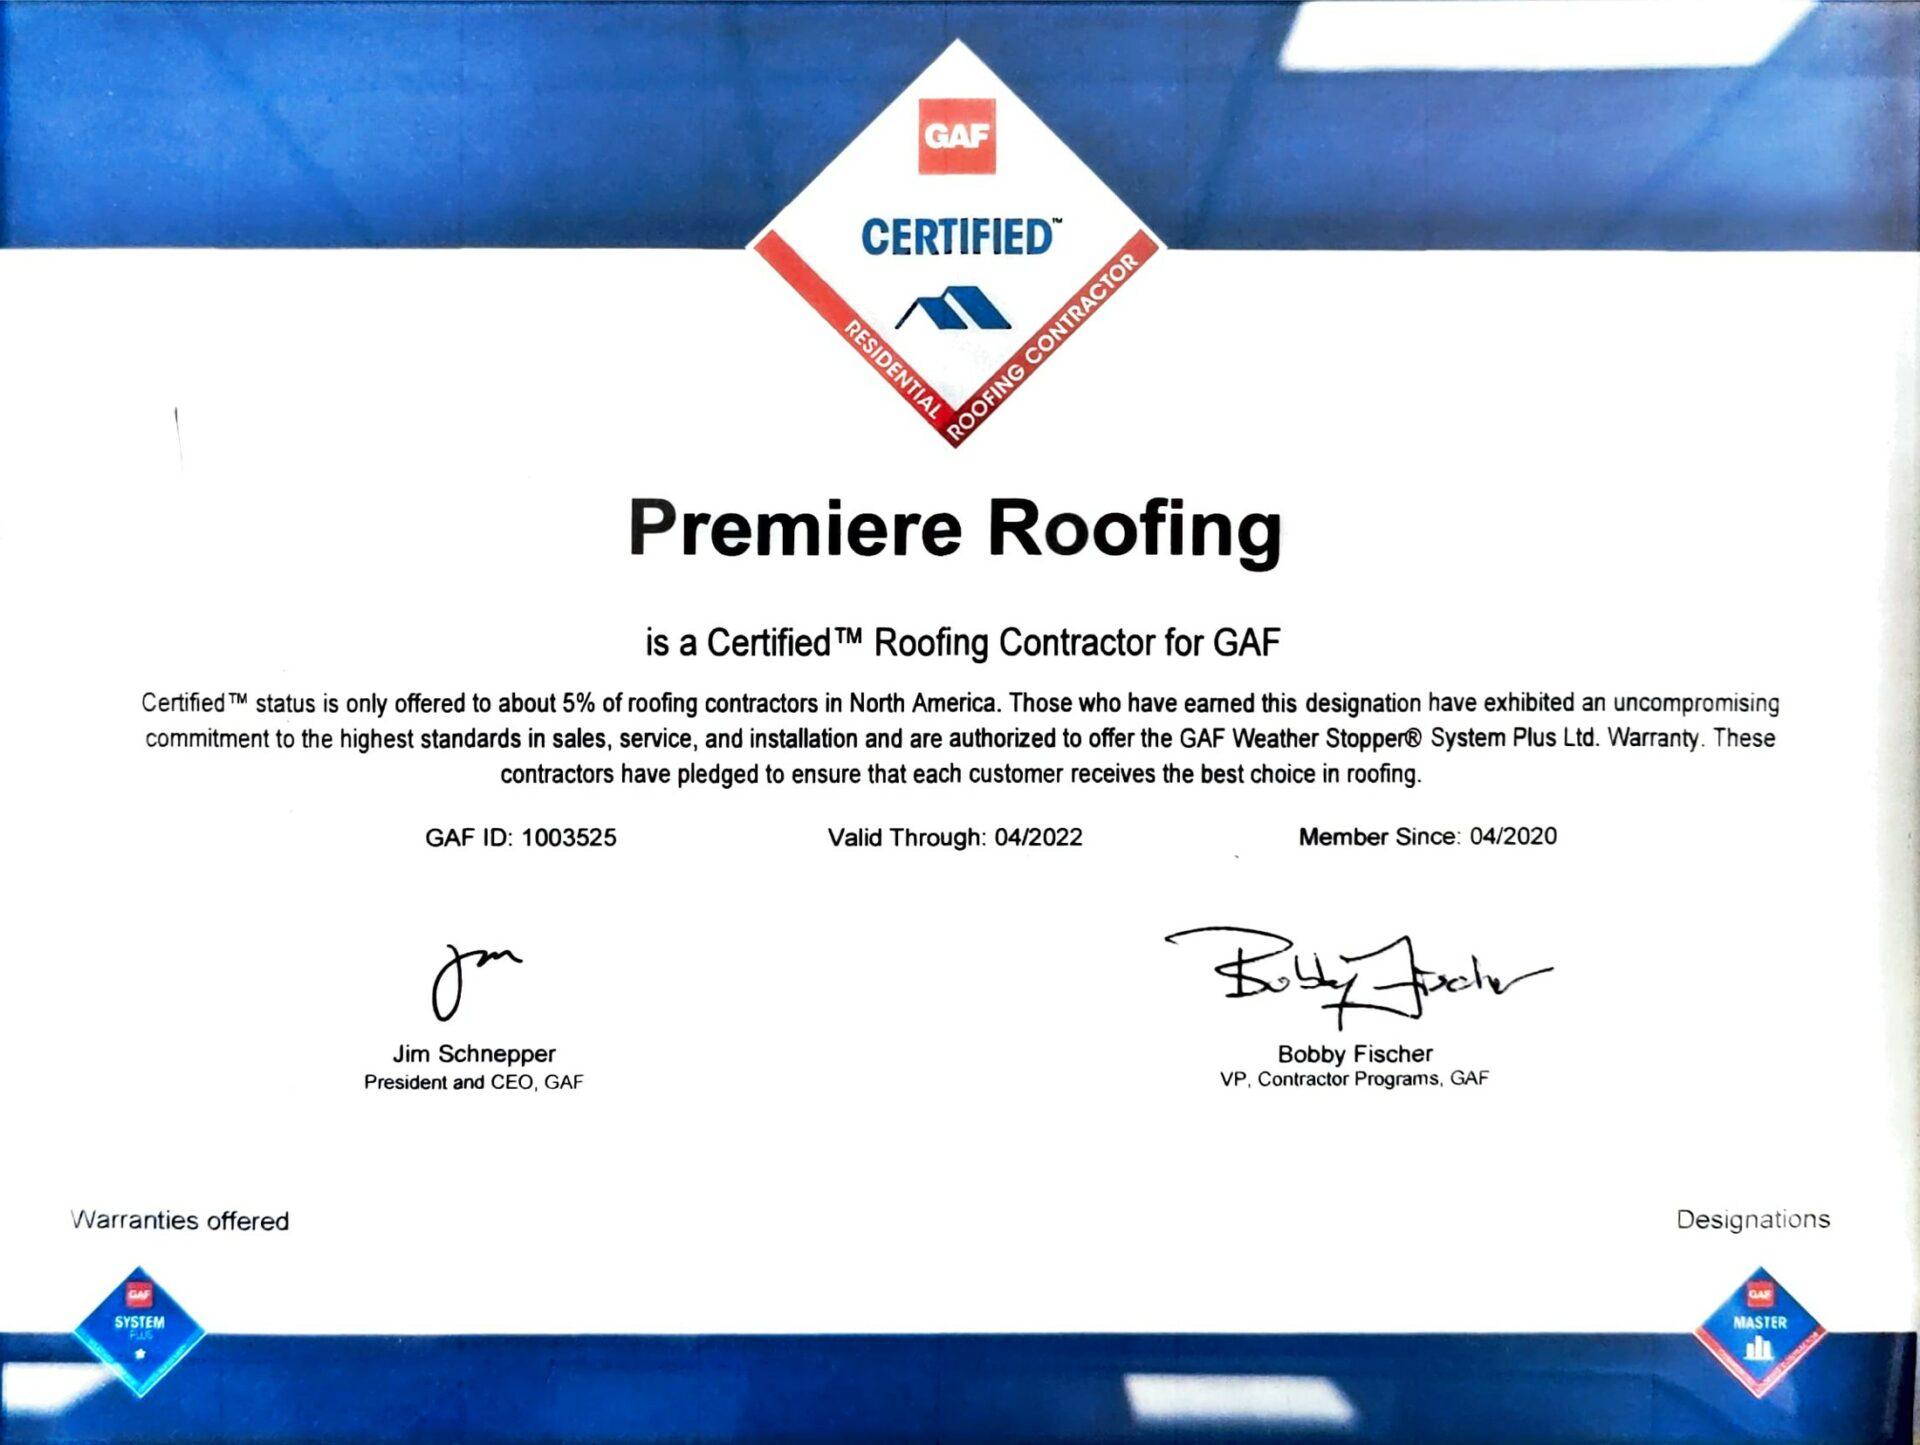 GAF Certified Premiere Roofing